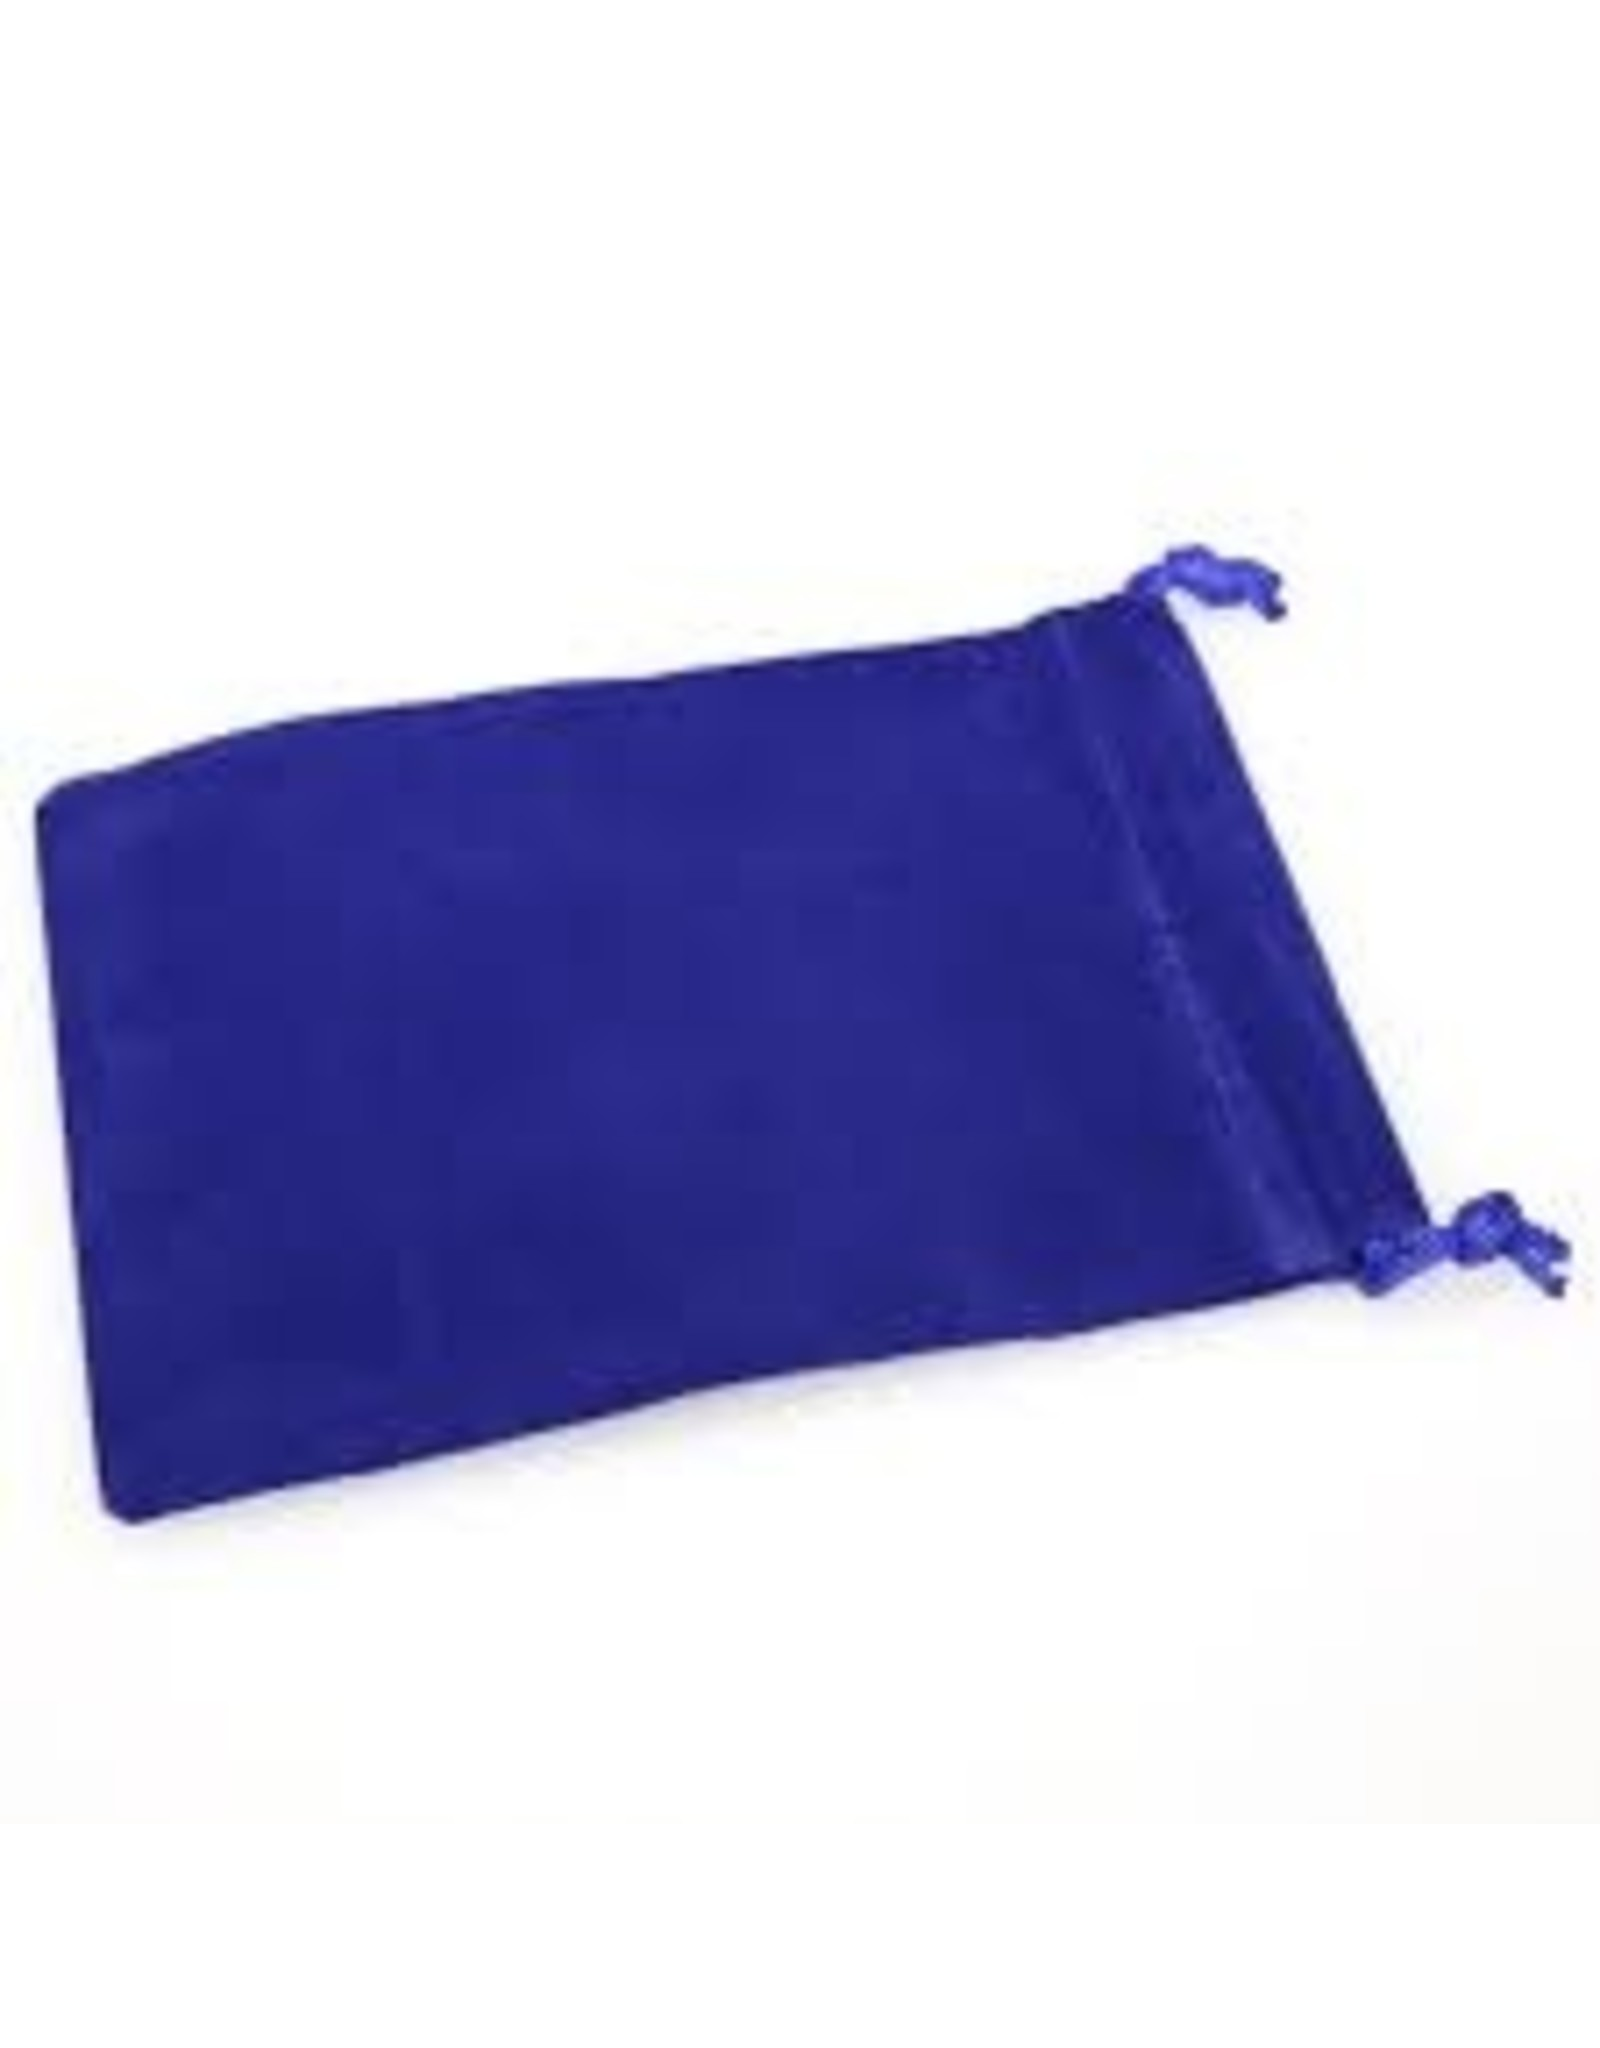 Chessex Suedecloth dice bag, sm blue